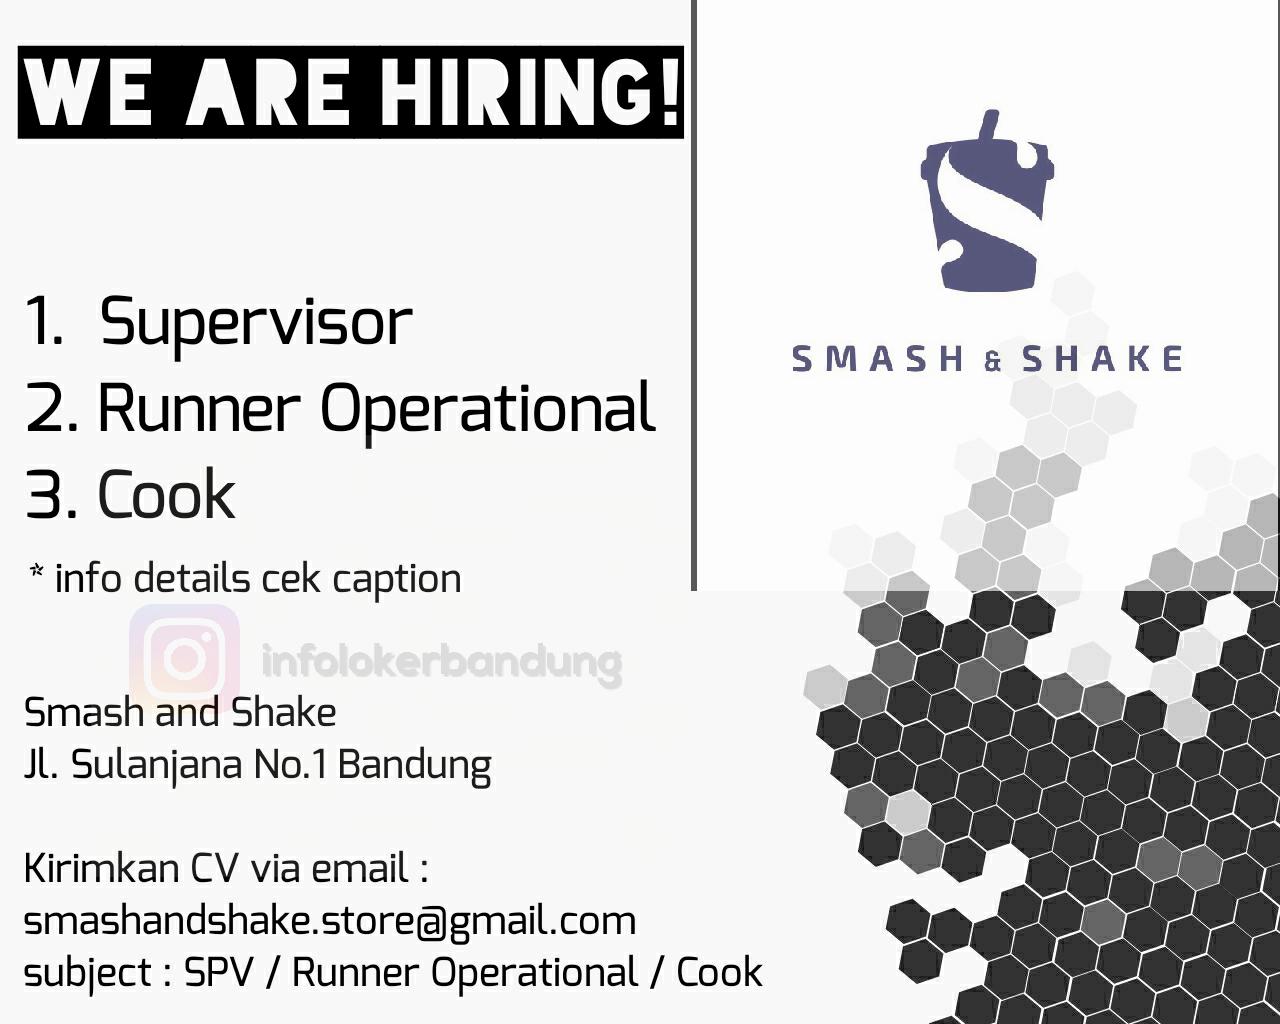 Lowongan Kerja Smash And Shake Cafe Bandung Januari 2017